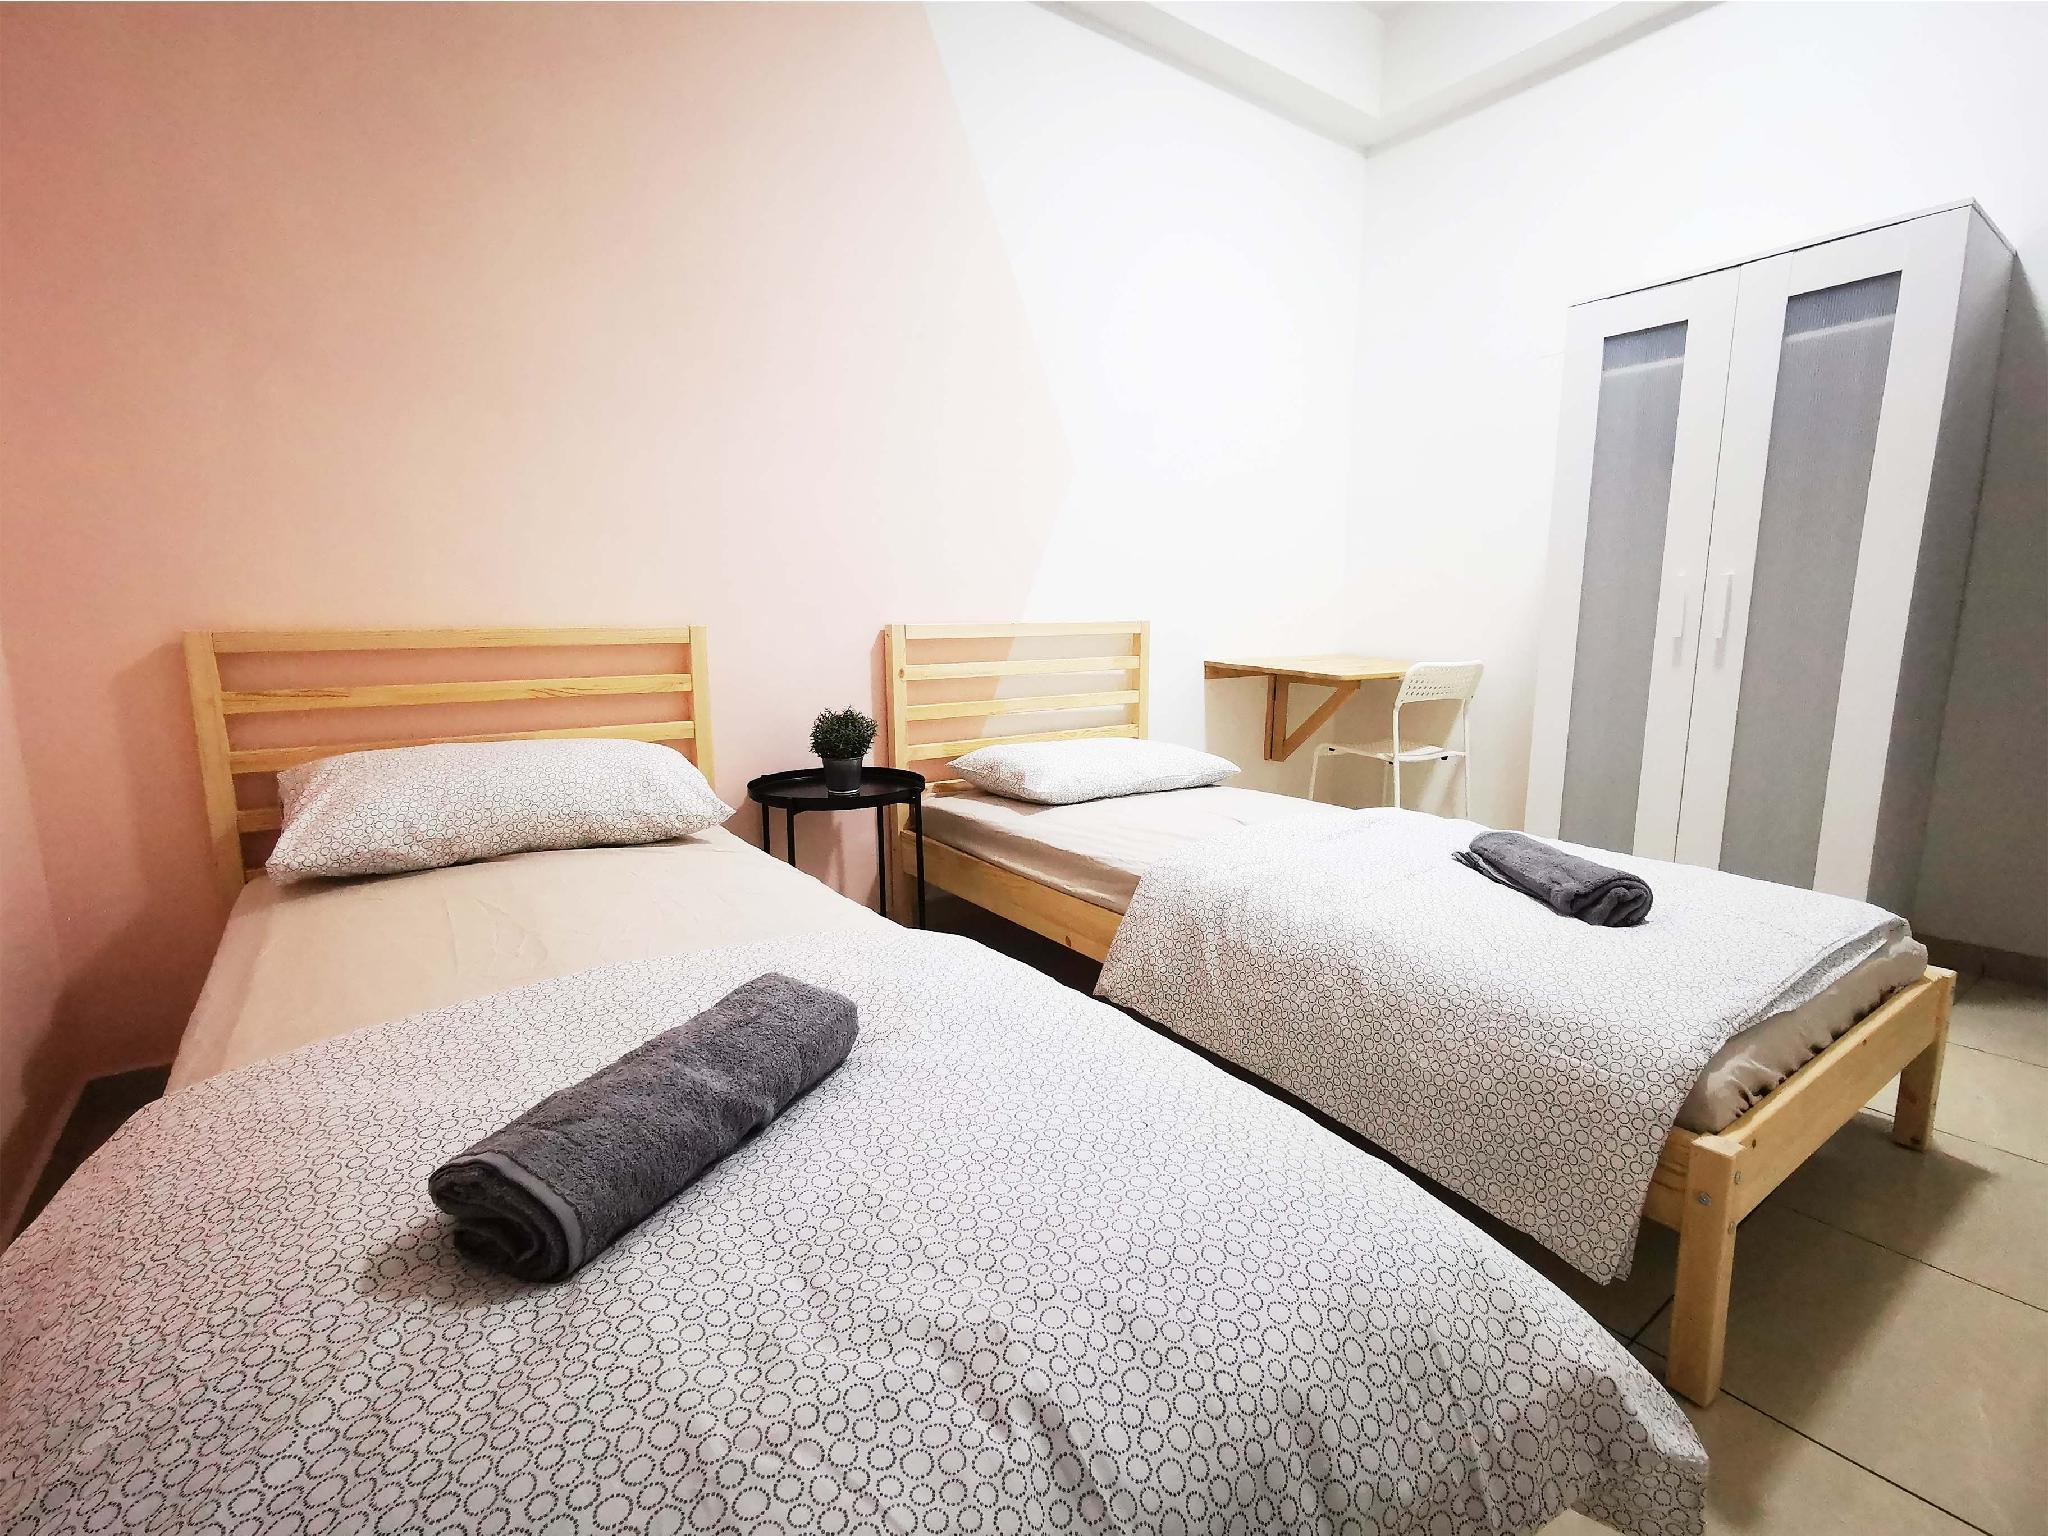 Desire Room At Bukit Indah * Aeon Mall * 1709 R3